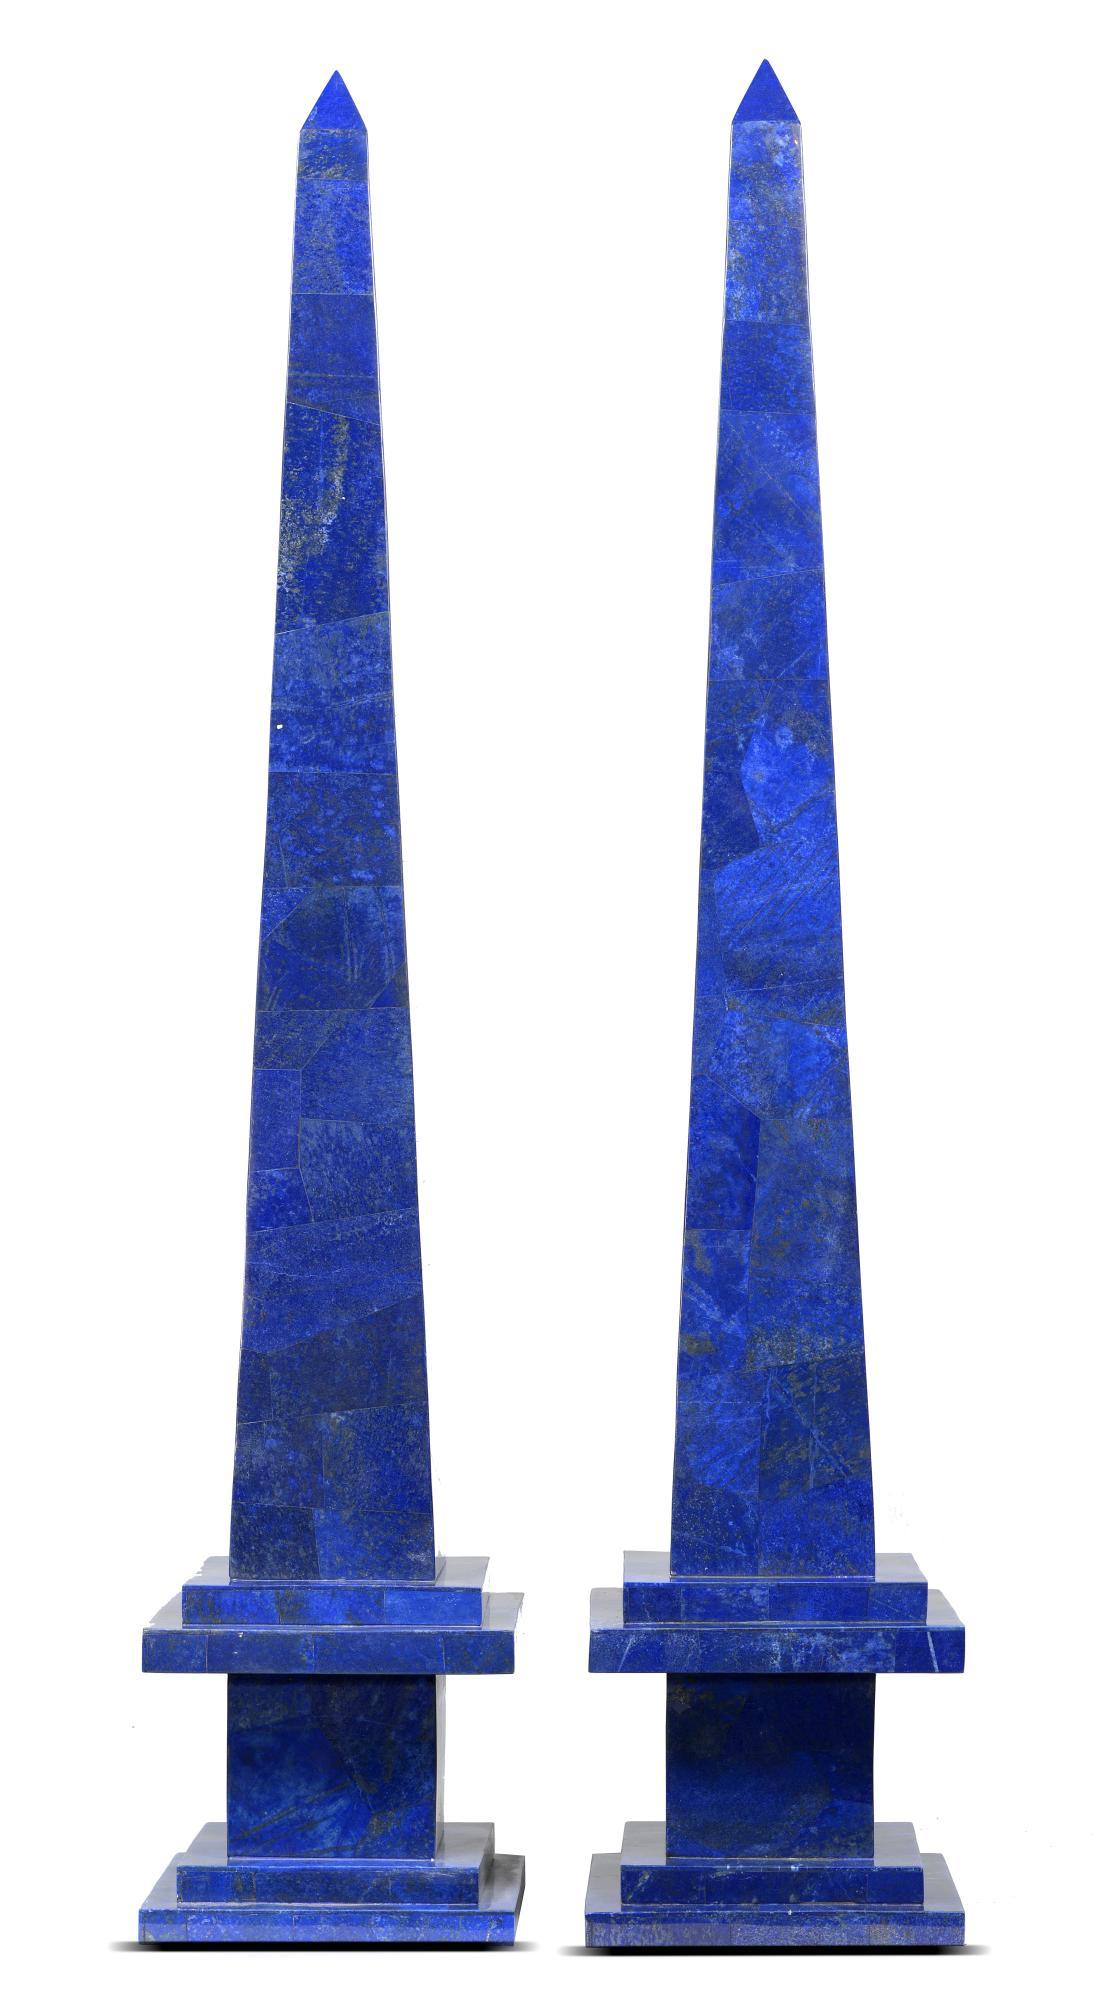 Lot 3 - Interior Design/Minerals: A pair of massive lapis lazuli veneered obelisks, Afghanistan, 131cm high